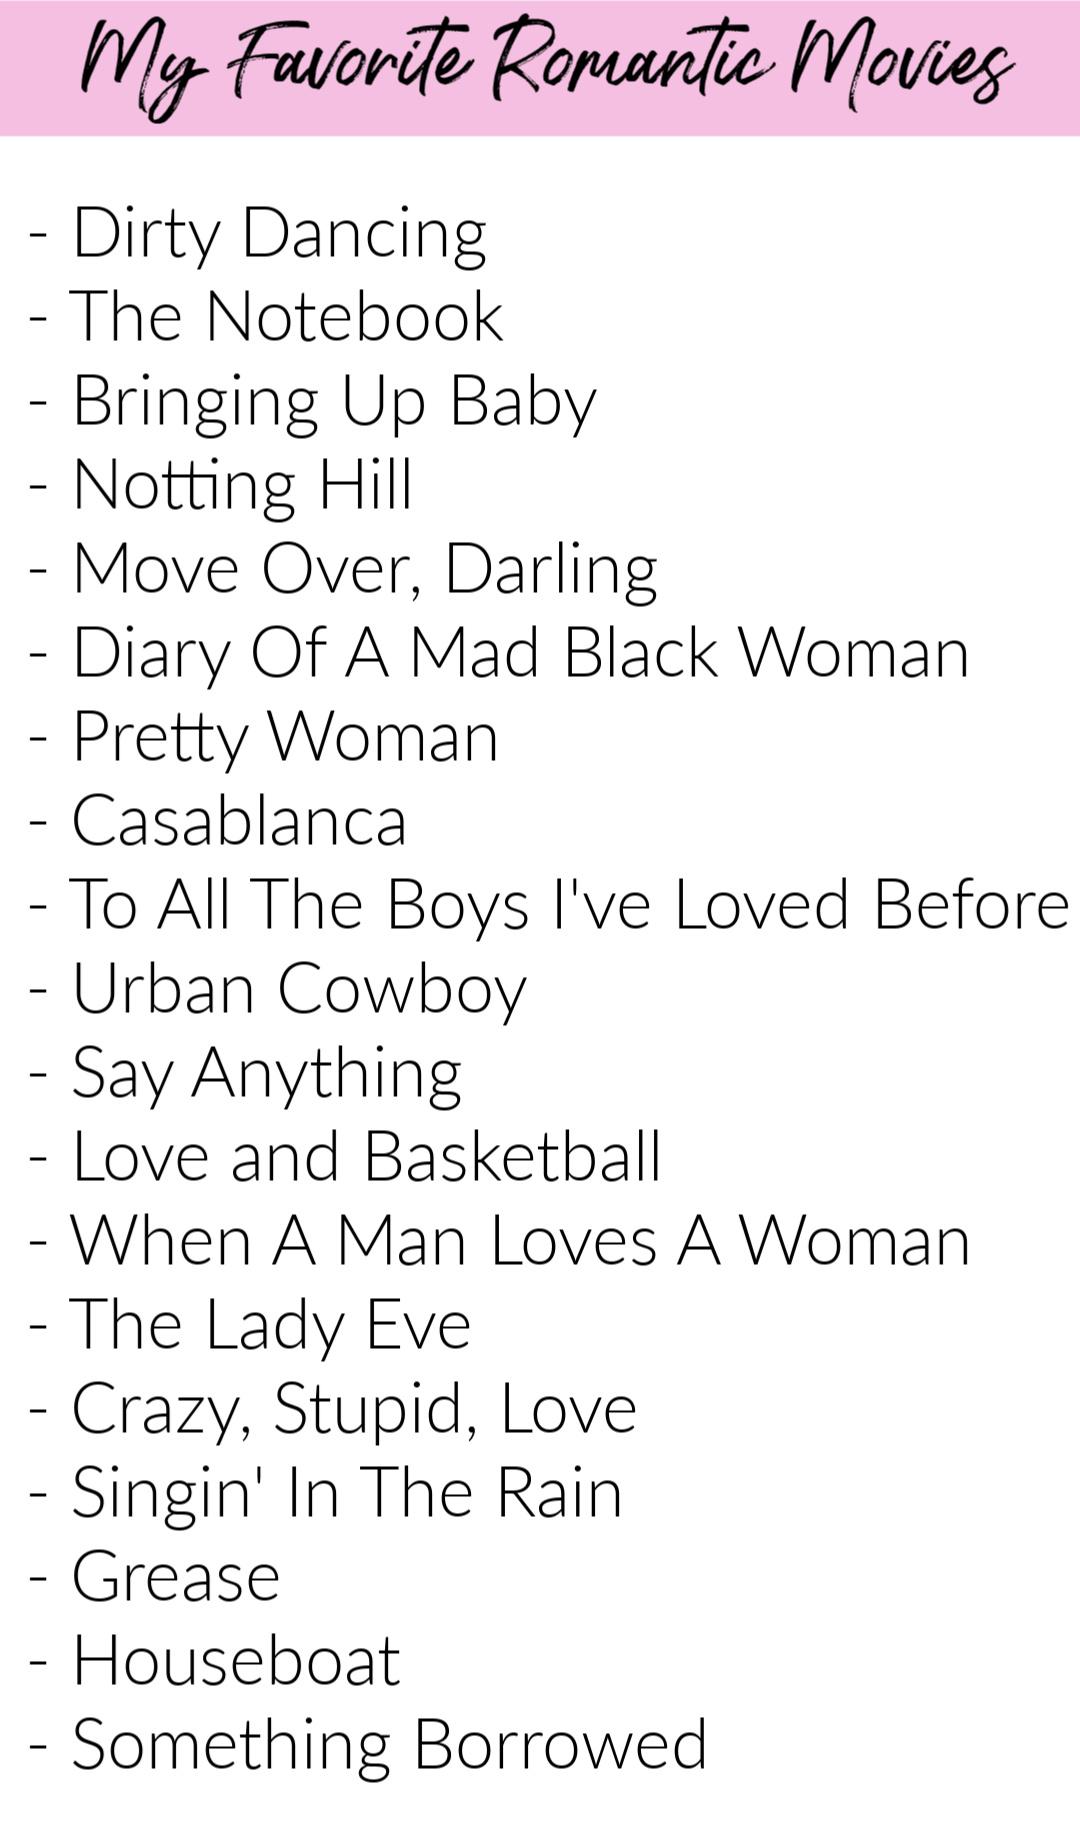 My Favorite Romantic Movies